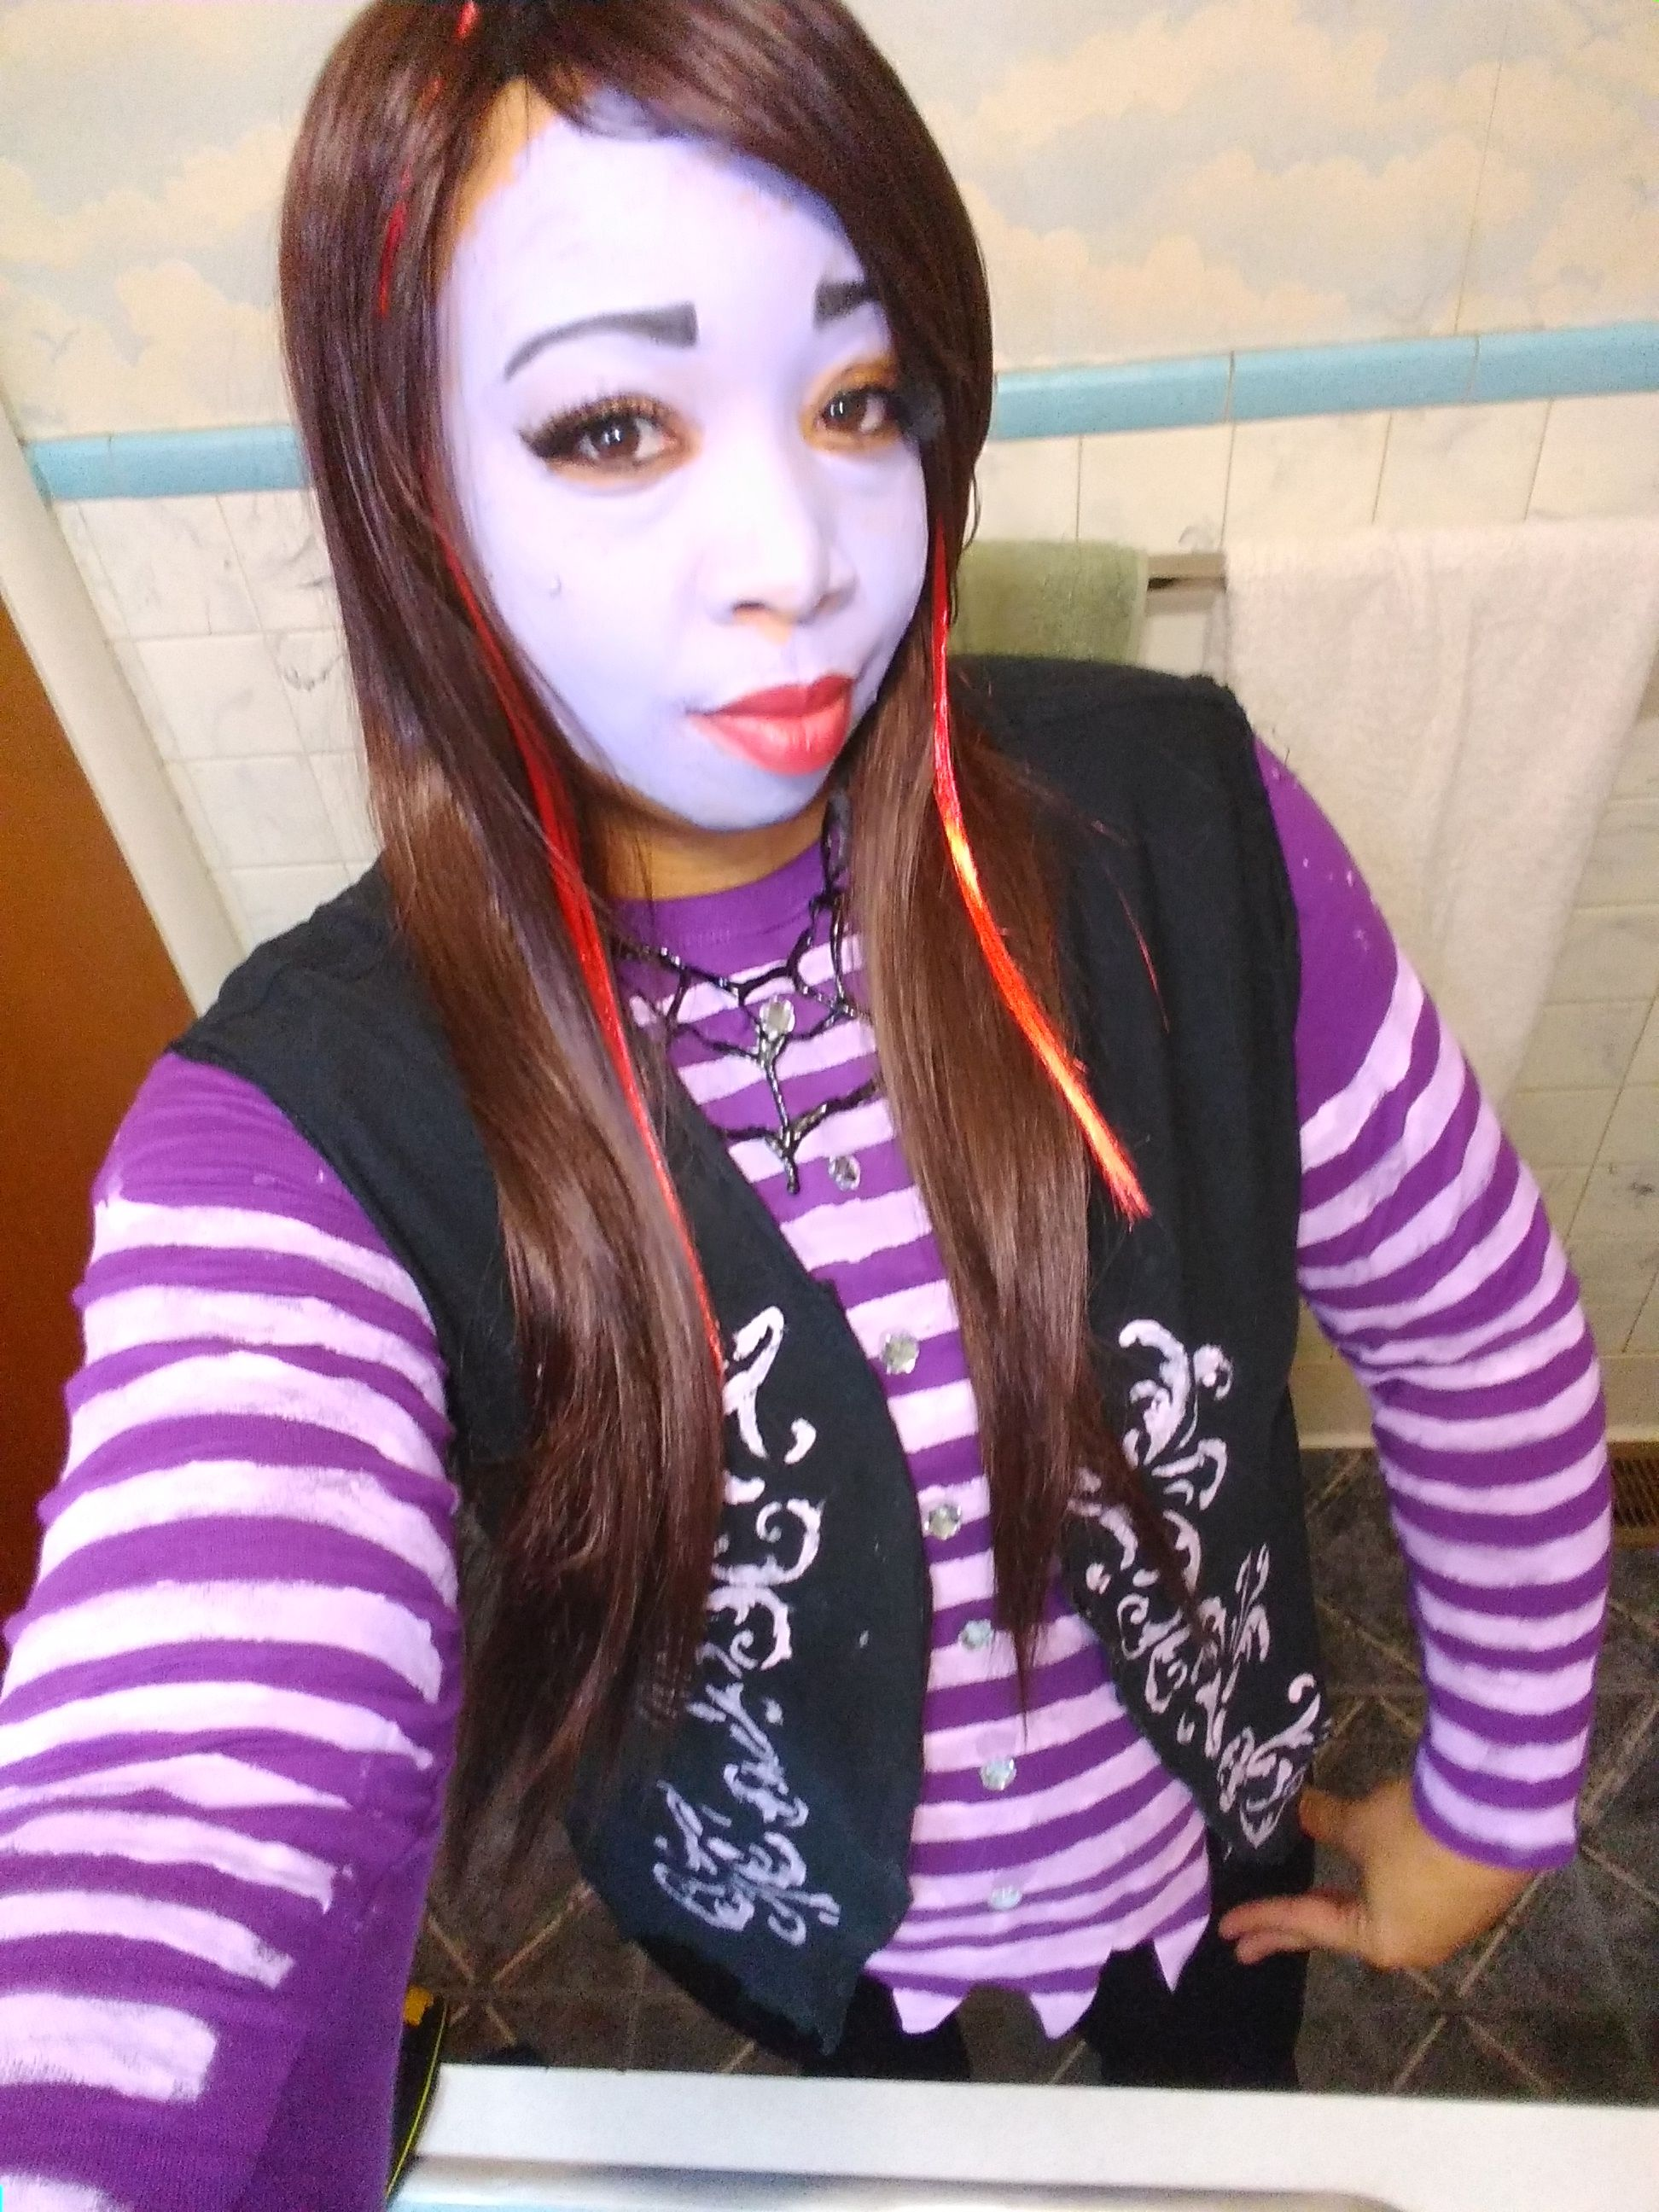 Diy Oxana Hauntley Vampirina S Mom Halloween Costume Checkout My Youtube Video On How I Did It Mom Halloween Costumes Halloween Costumes Diy Costumes